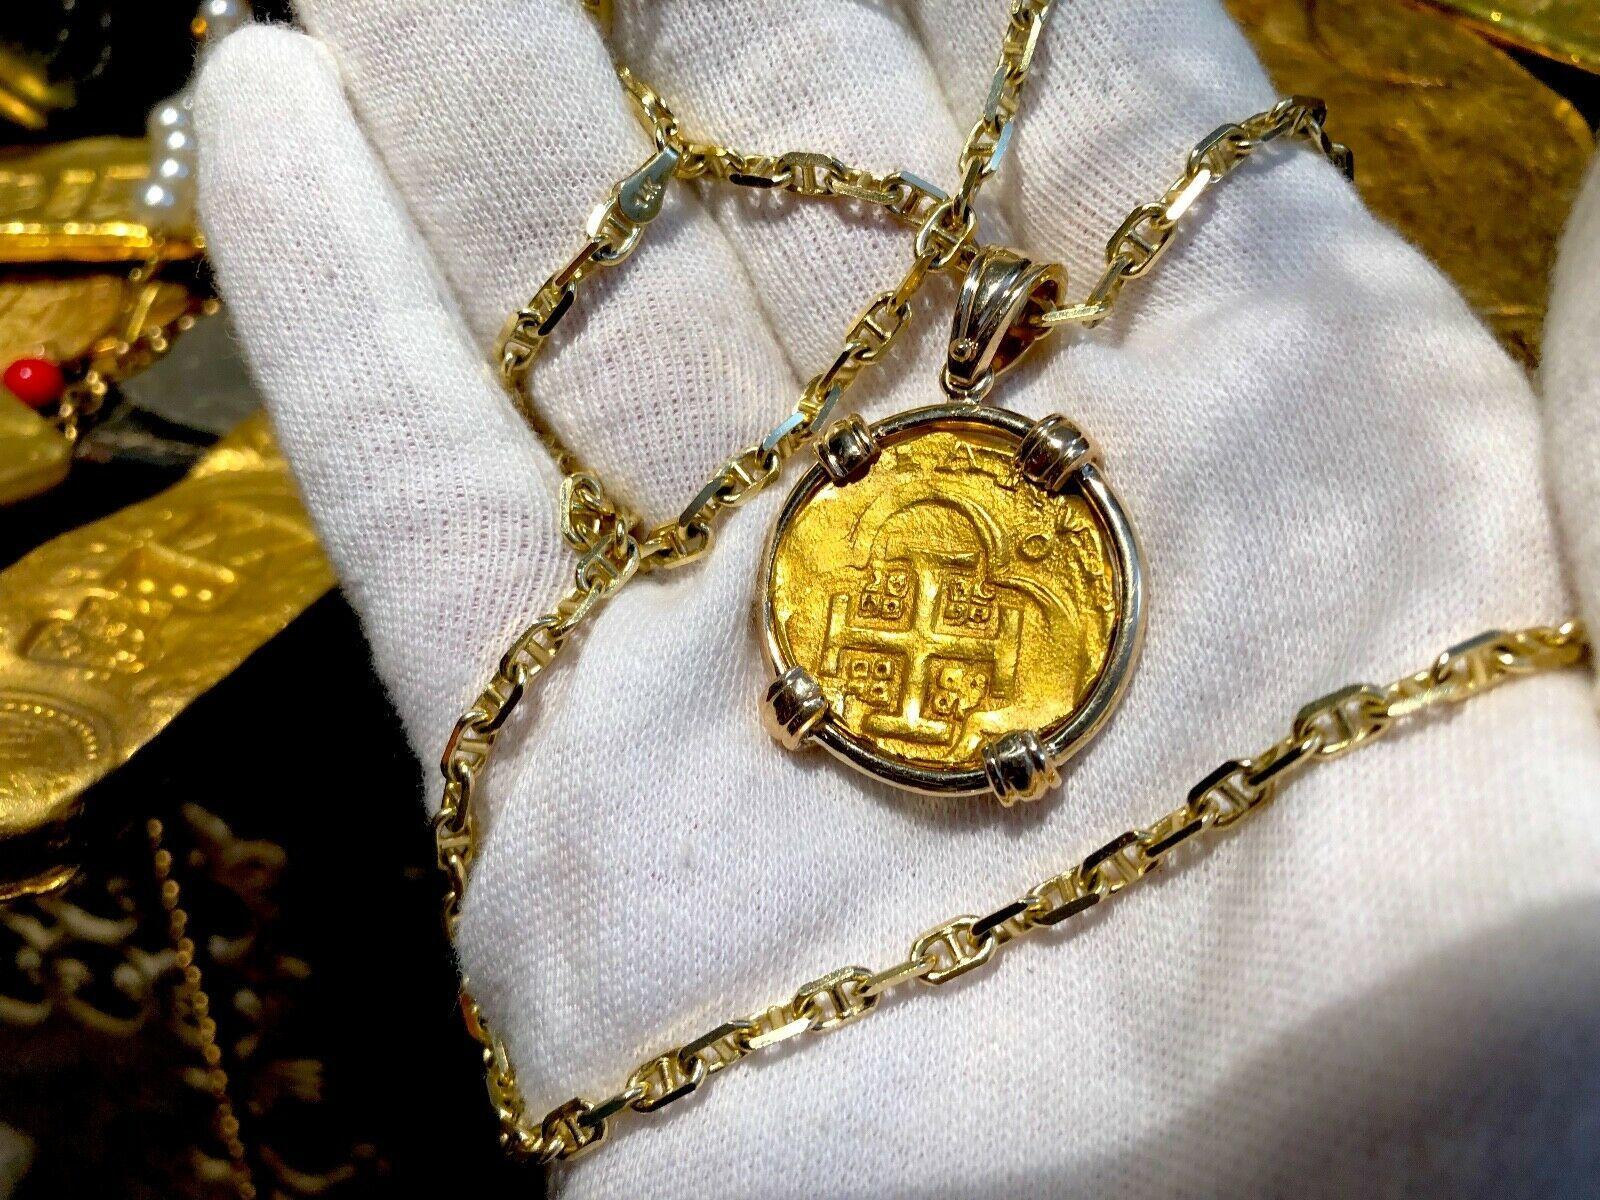 SPAIN 4 ESCUDOS 1630-47 TREASURE JEWELRY NECKLACE PENDANT PIRATE GOLD COIN